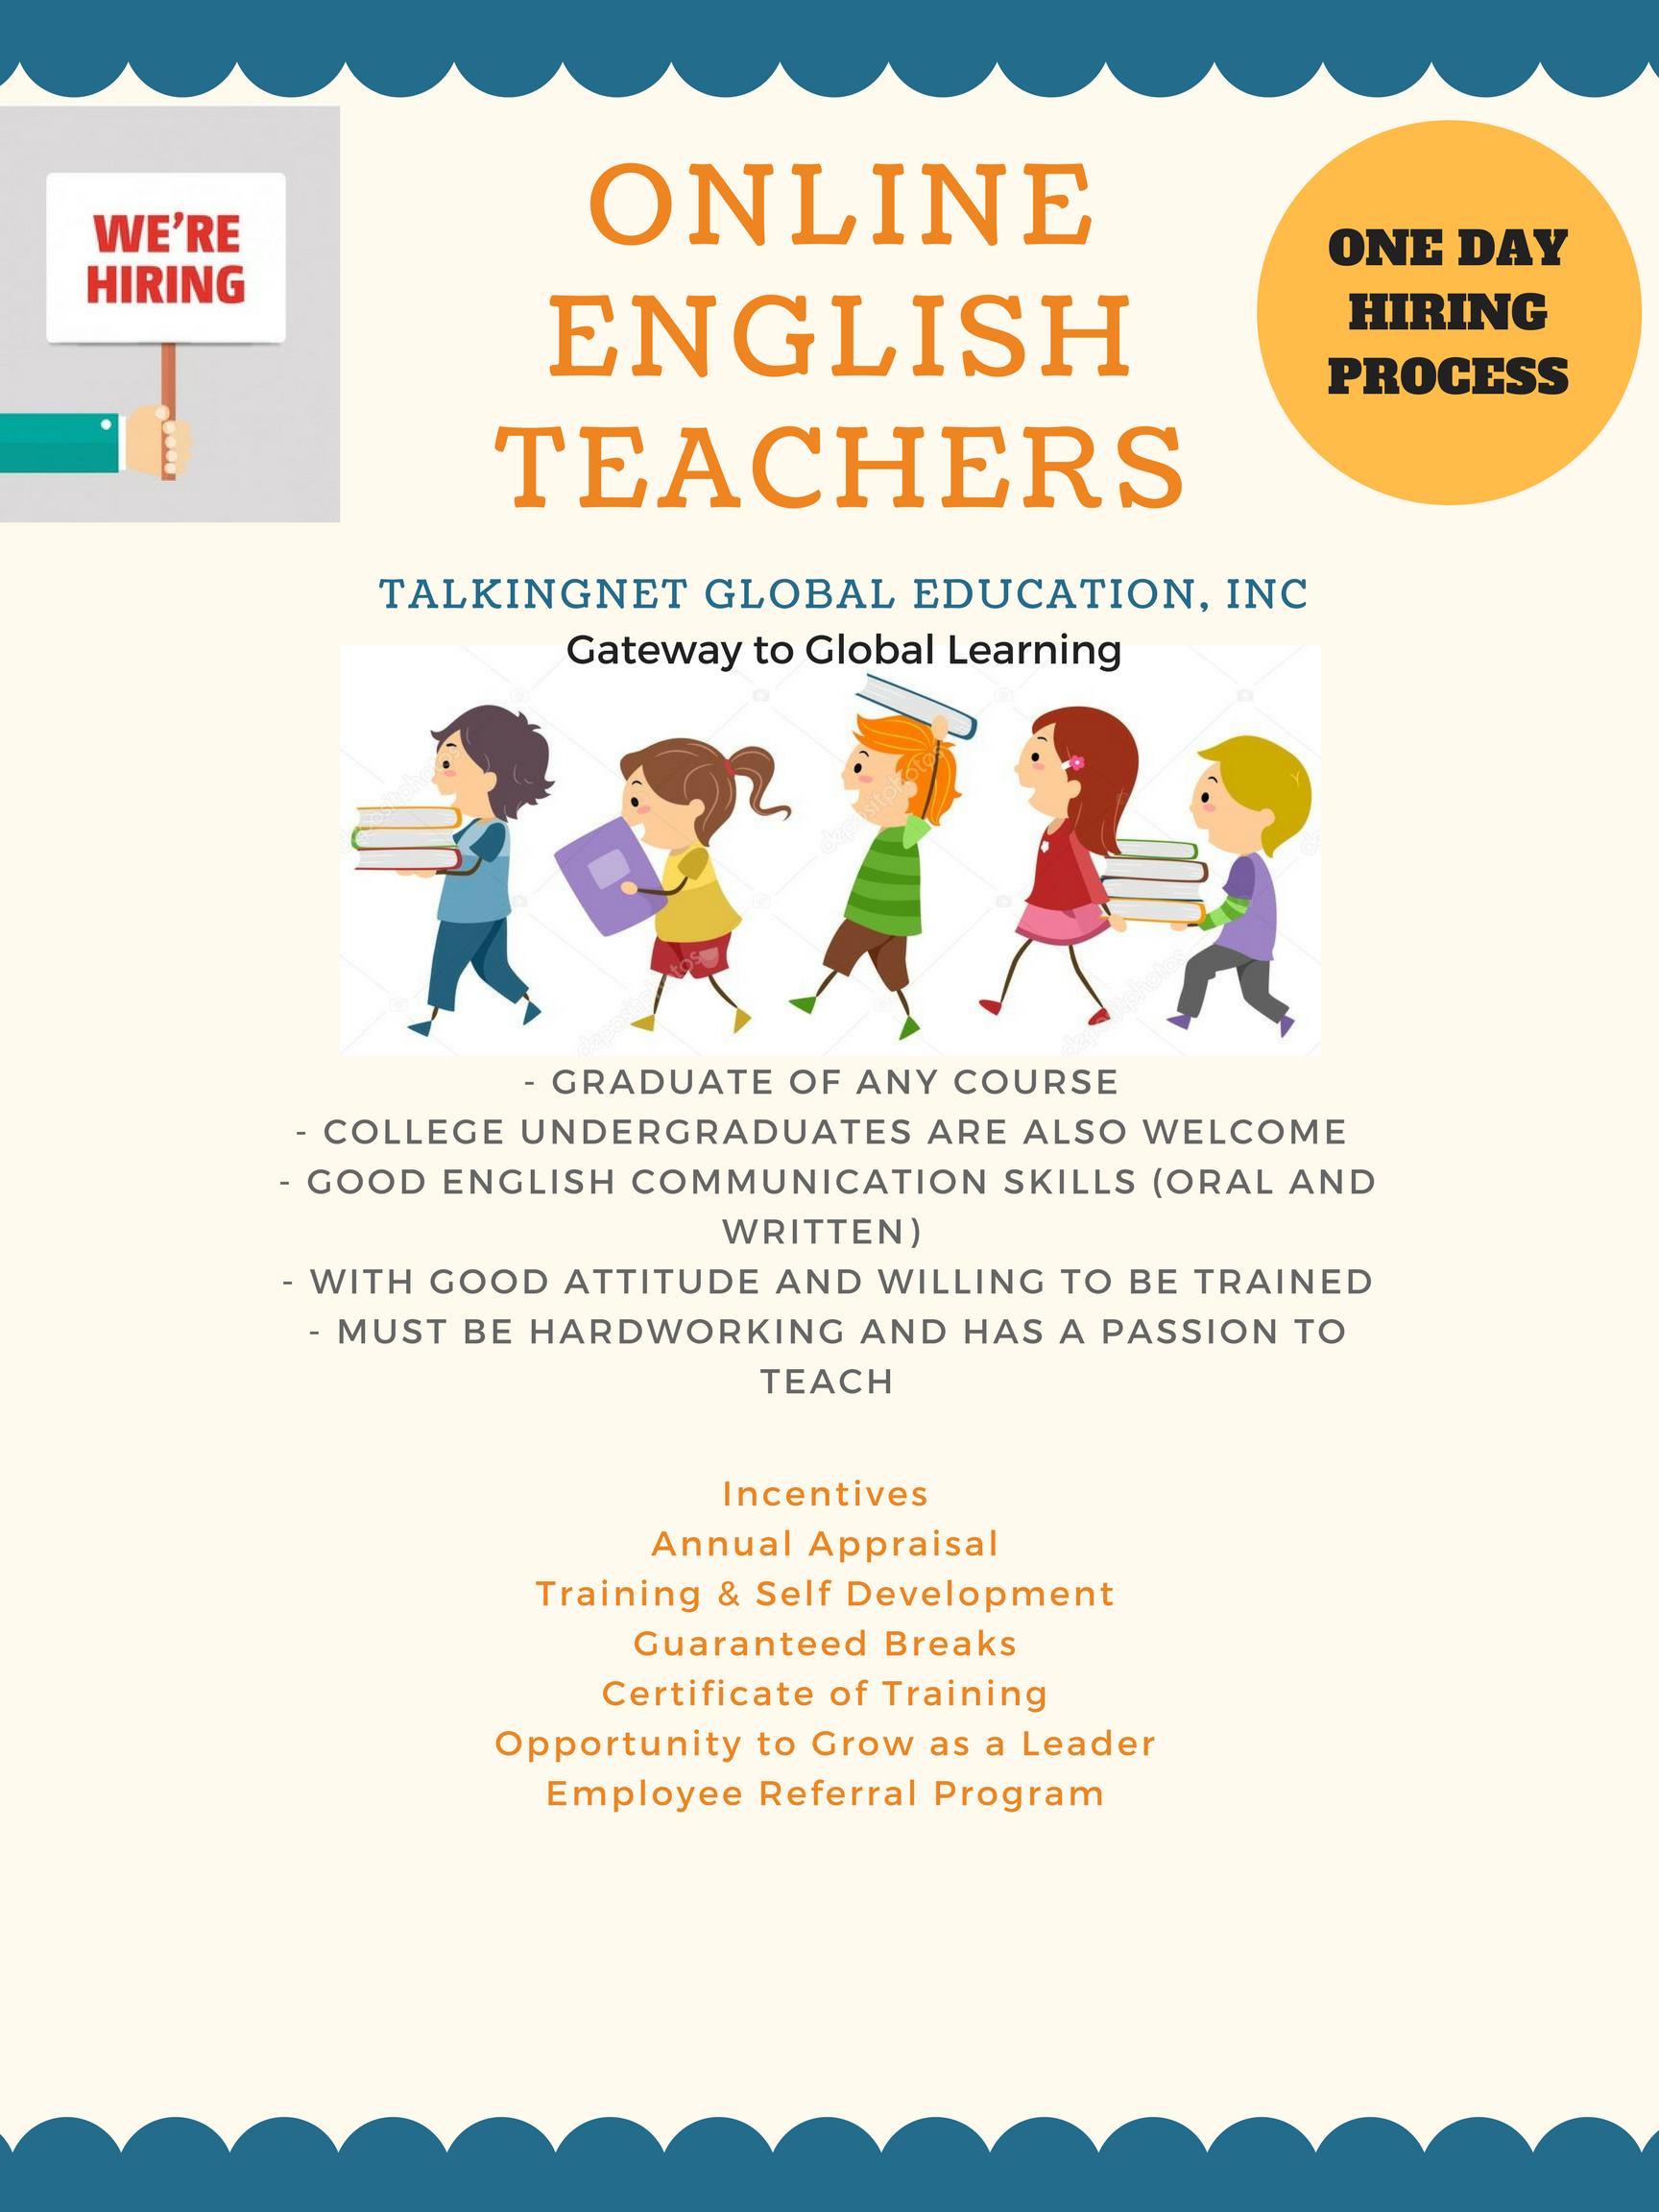 Esl Teacher from Talkingnet Global Education Inc.